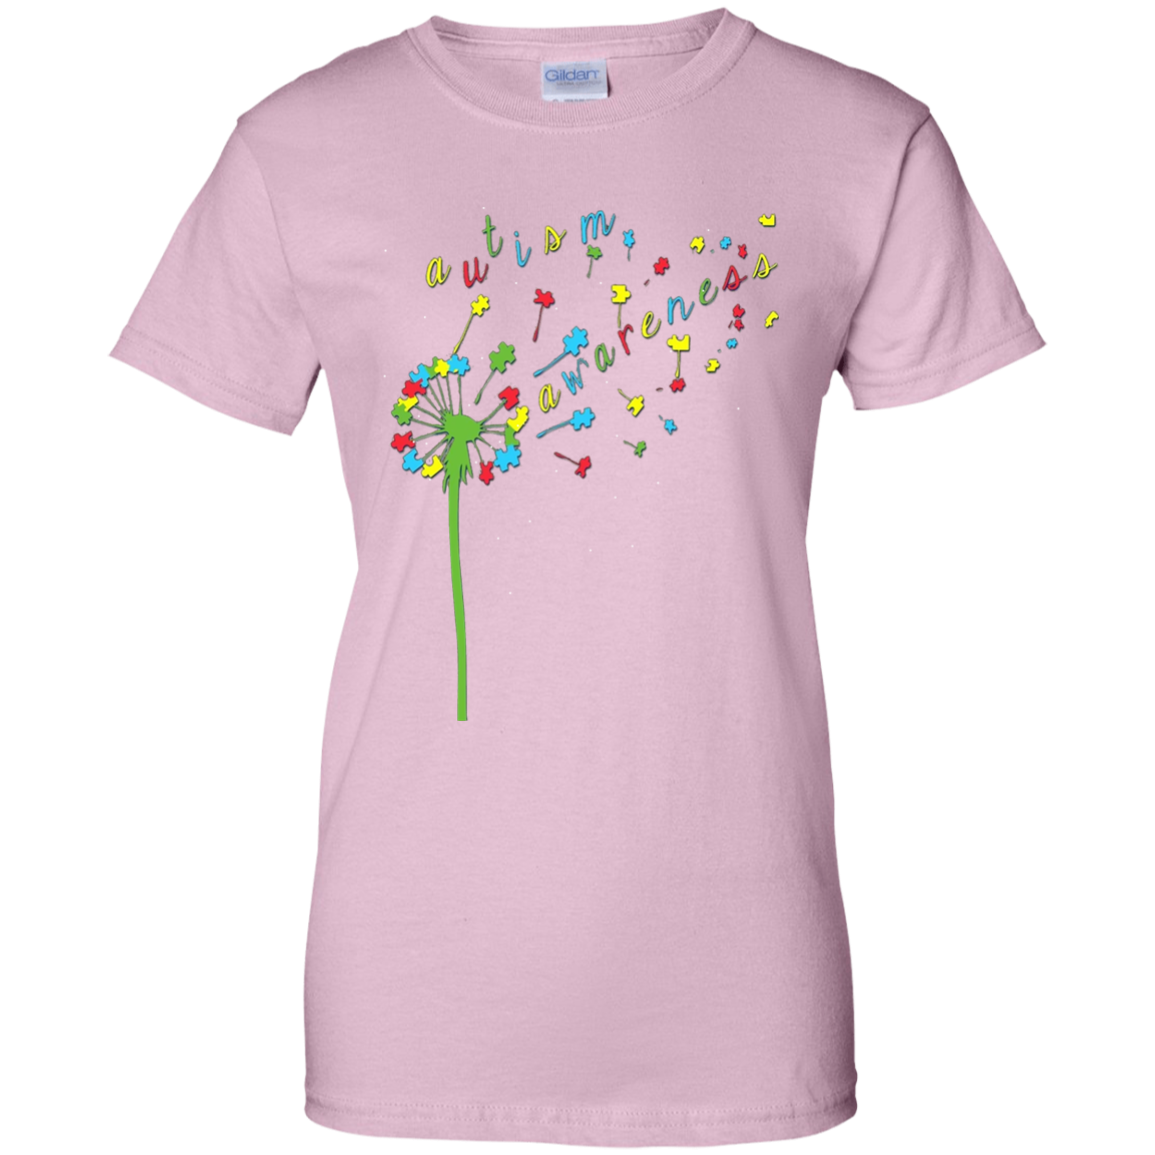 272571df7 Autism Shirts - Autism Awareness Ribbon T-shirts Mom/Dad/Kid G200L Gildan  Ladies' 100% Cotton T-Shirt